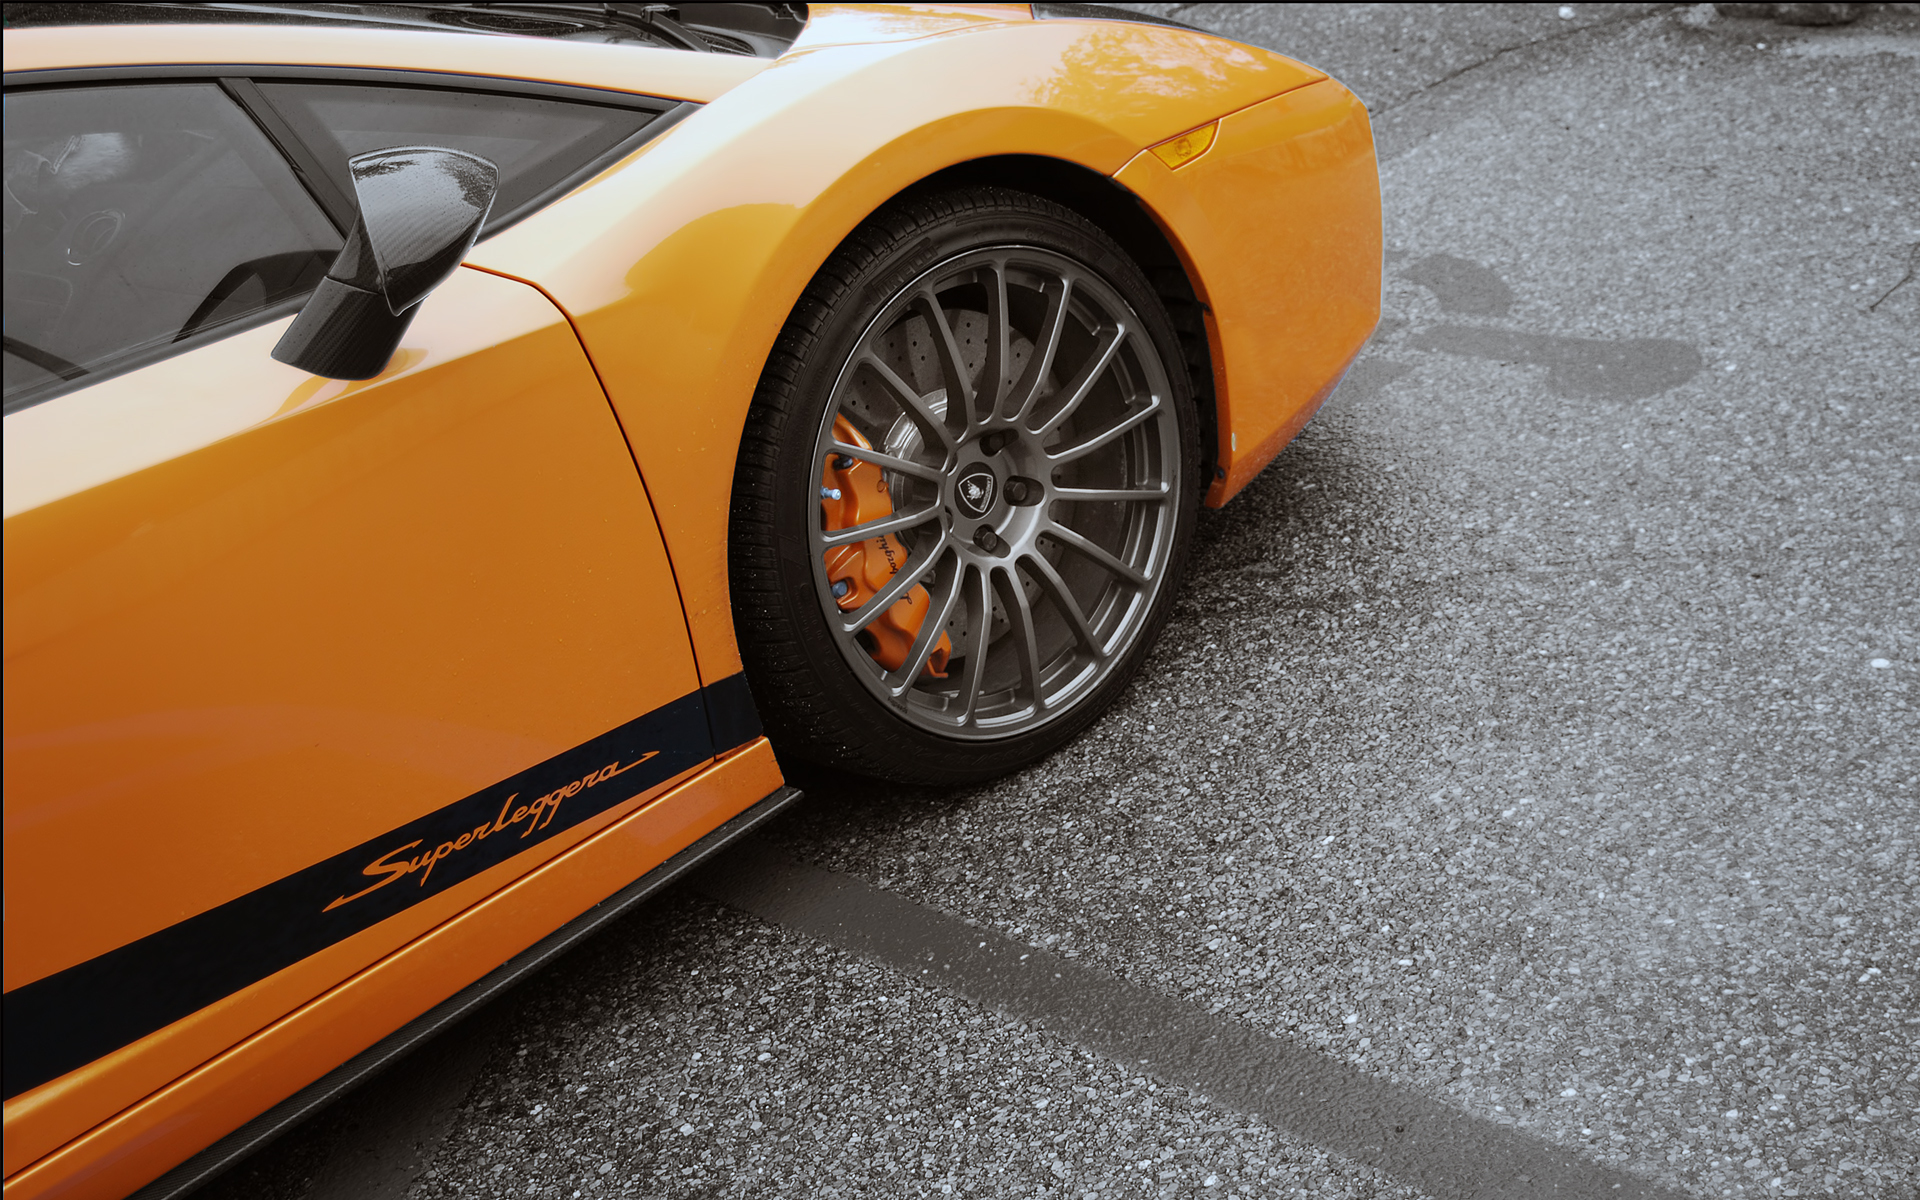 ламборджини, галлардо, оранжевый